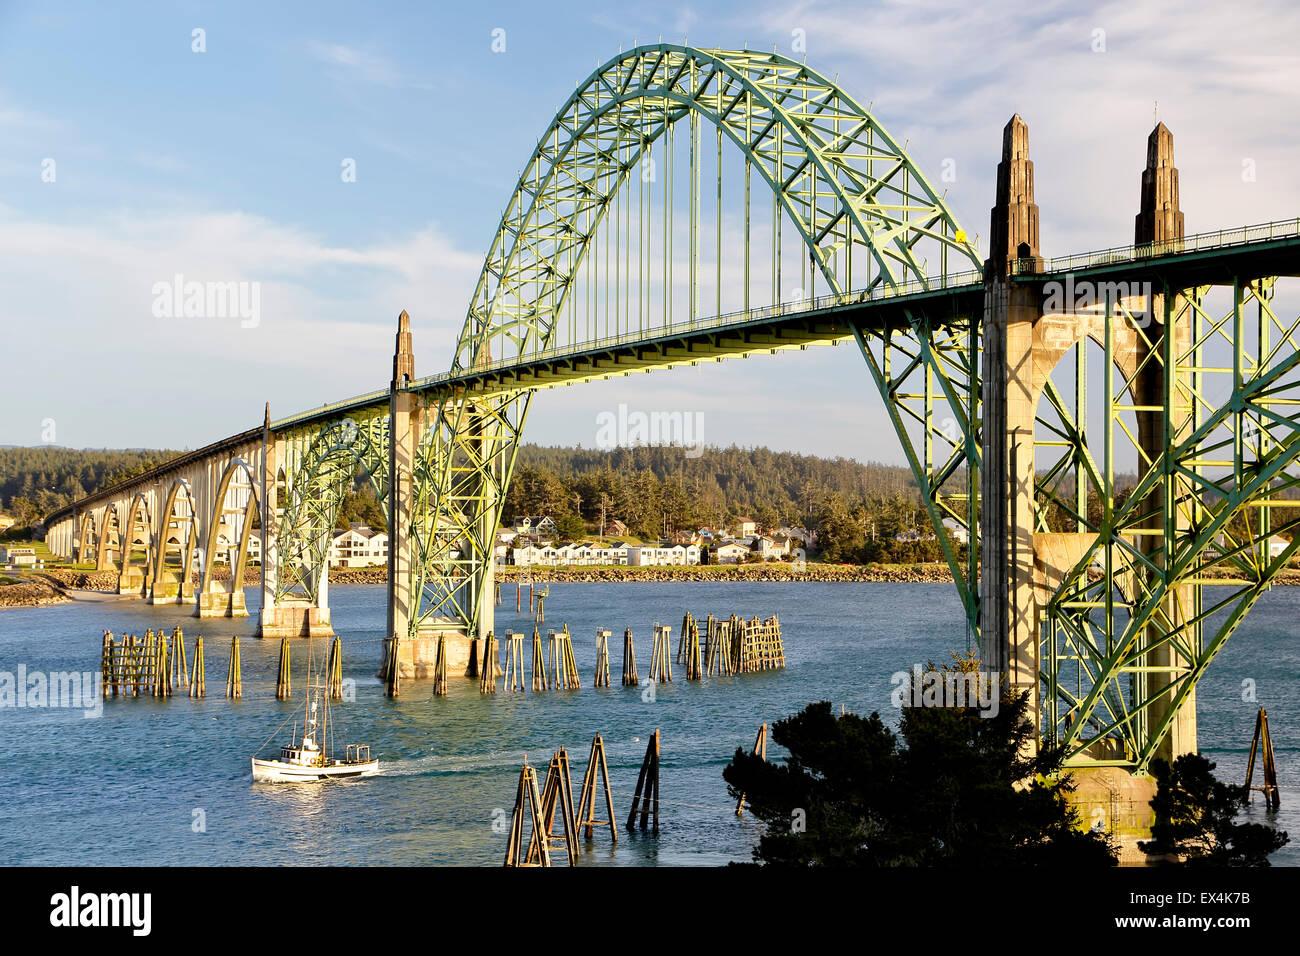 Yaquina Bay Bridge und Fischerboot, Newport, Oregon usa Stockbild